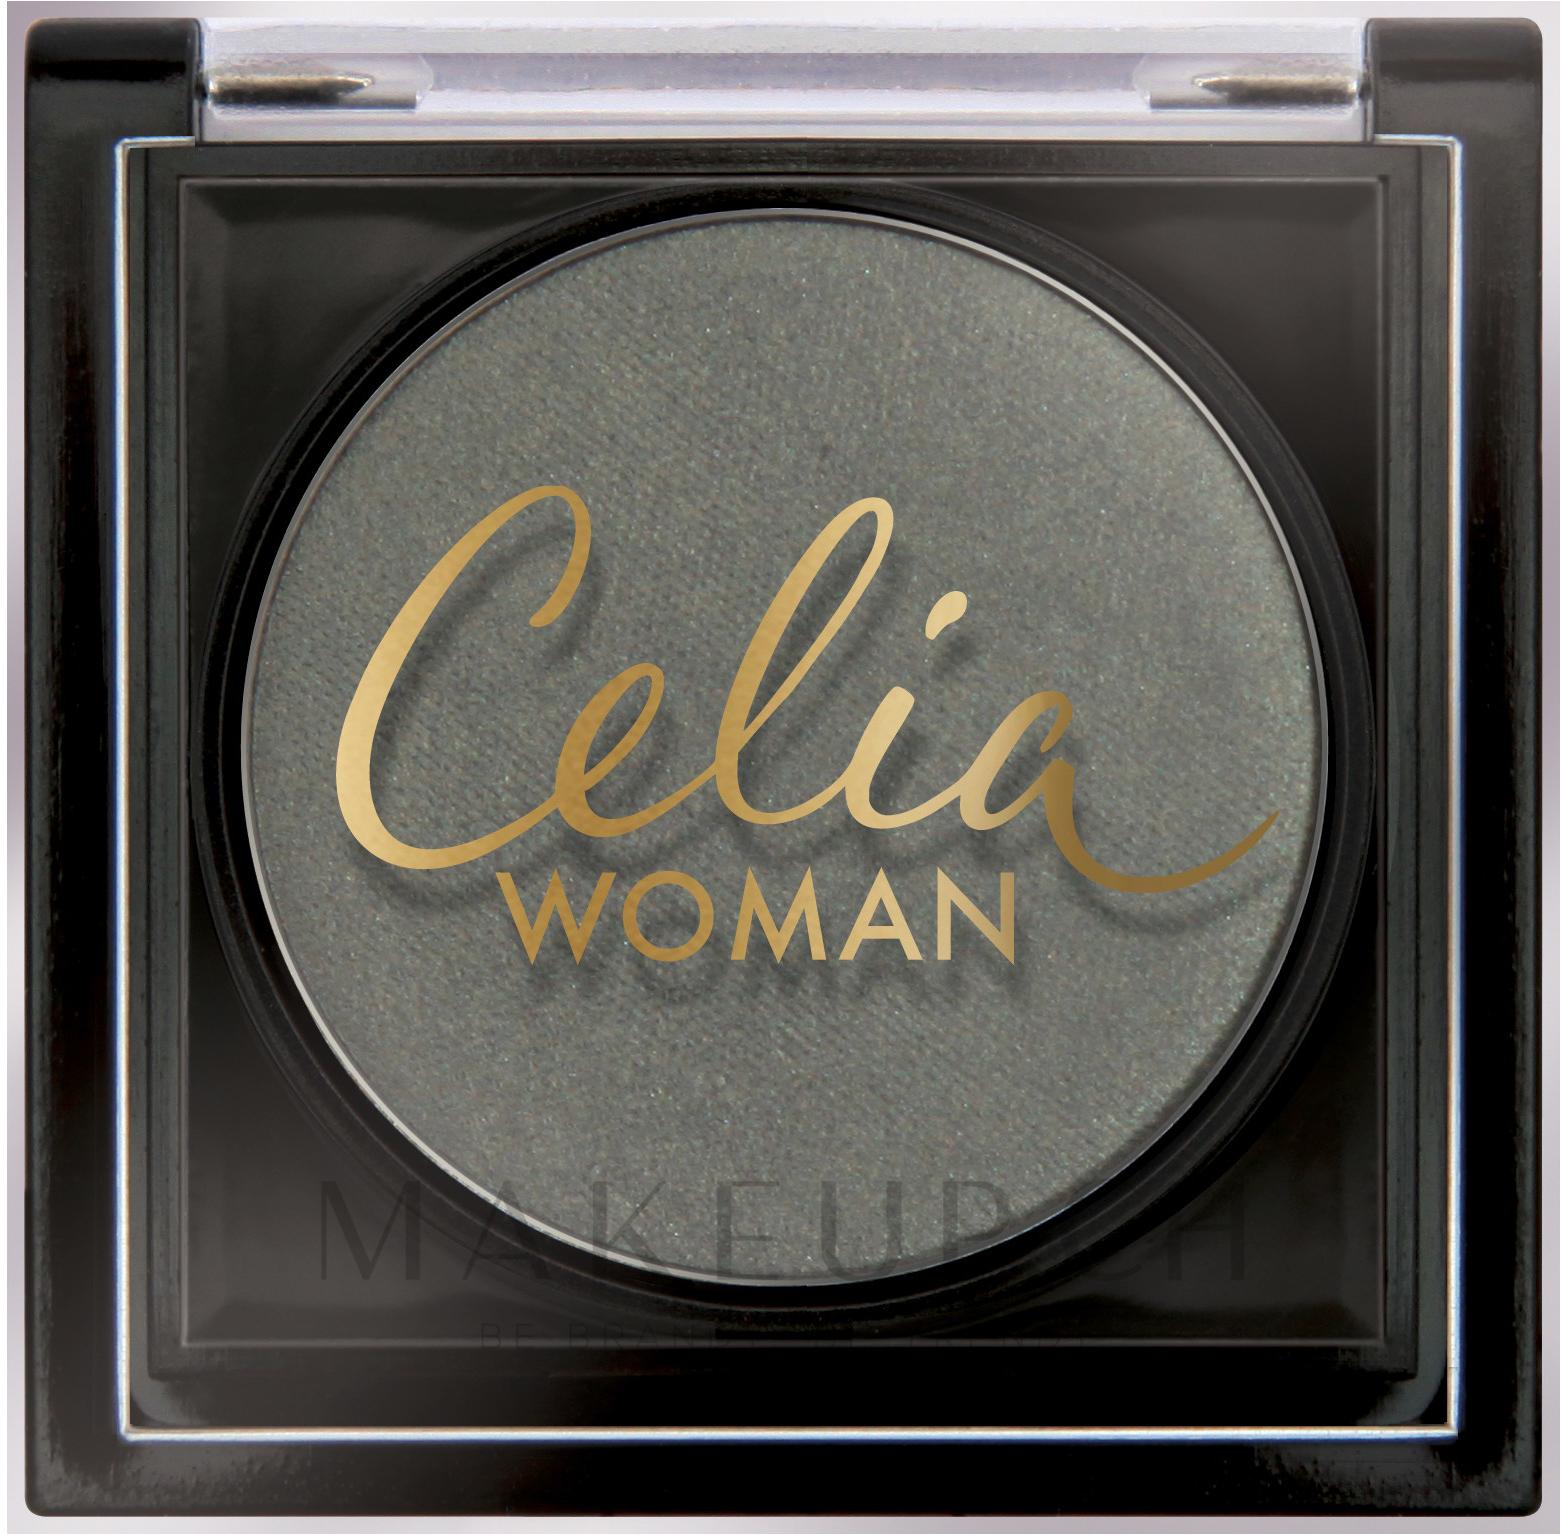 Lidschatten - Celia Woman Eyeshadow — Bild 11